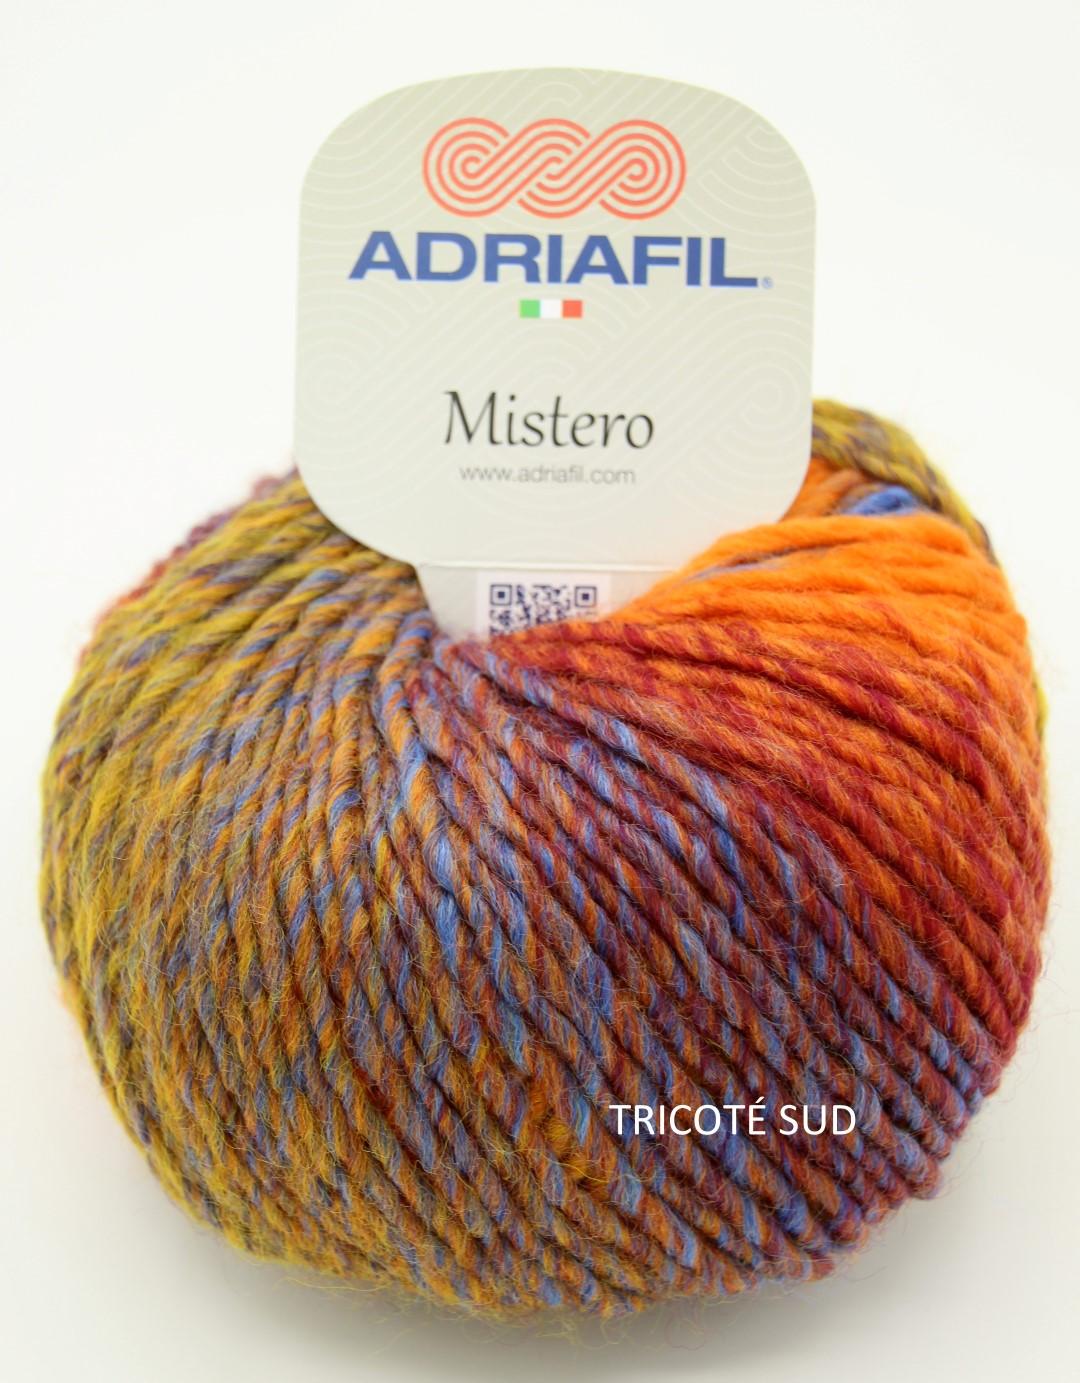 MISTERO ADRIAFIL COLORIS 64 (1) (Large)